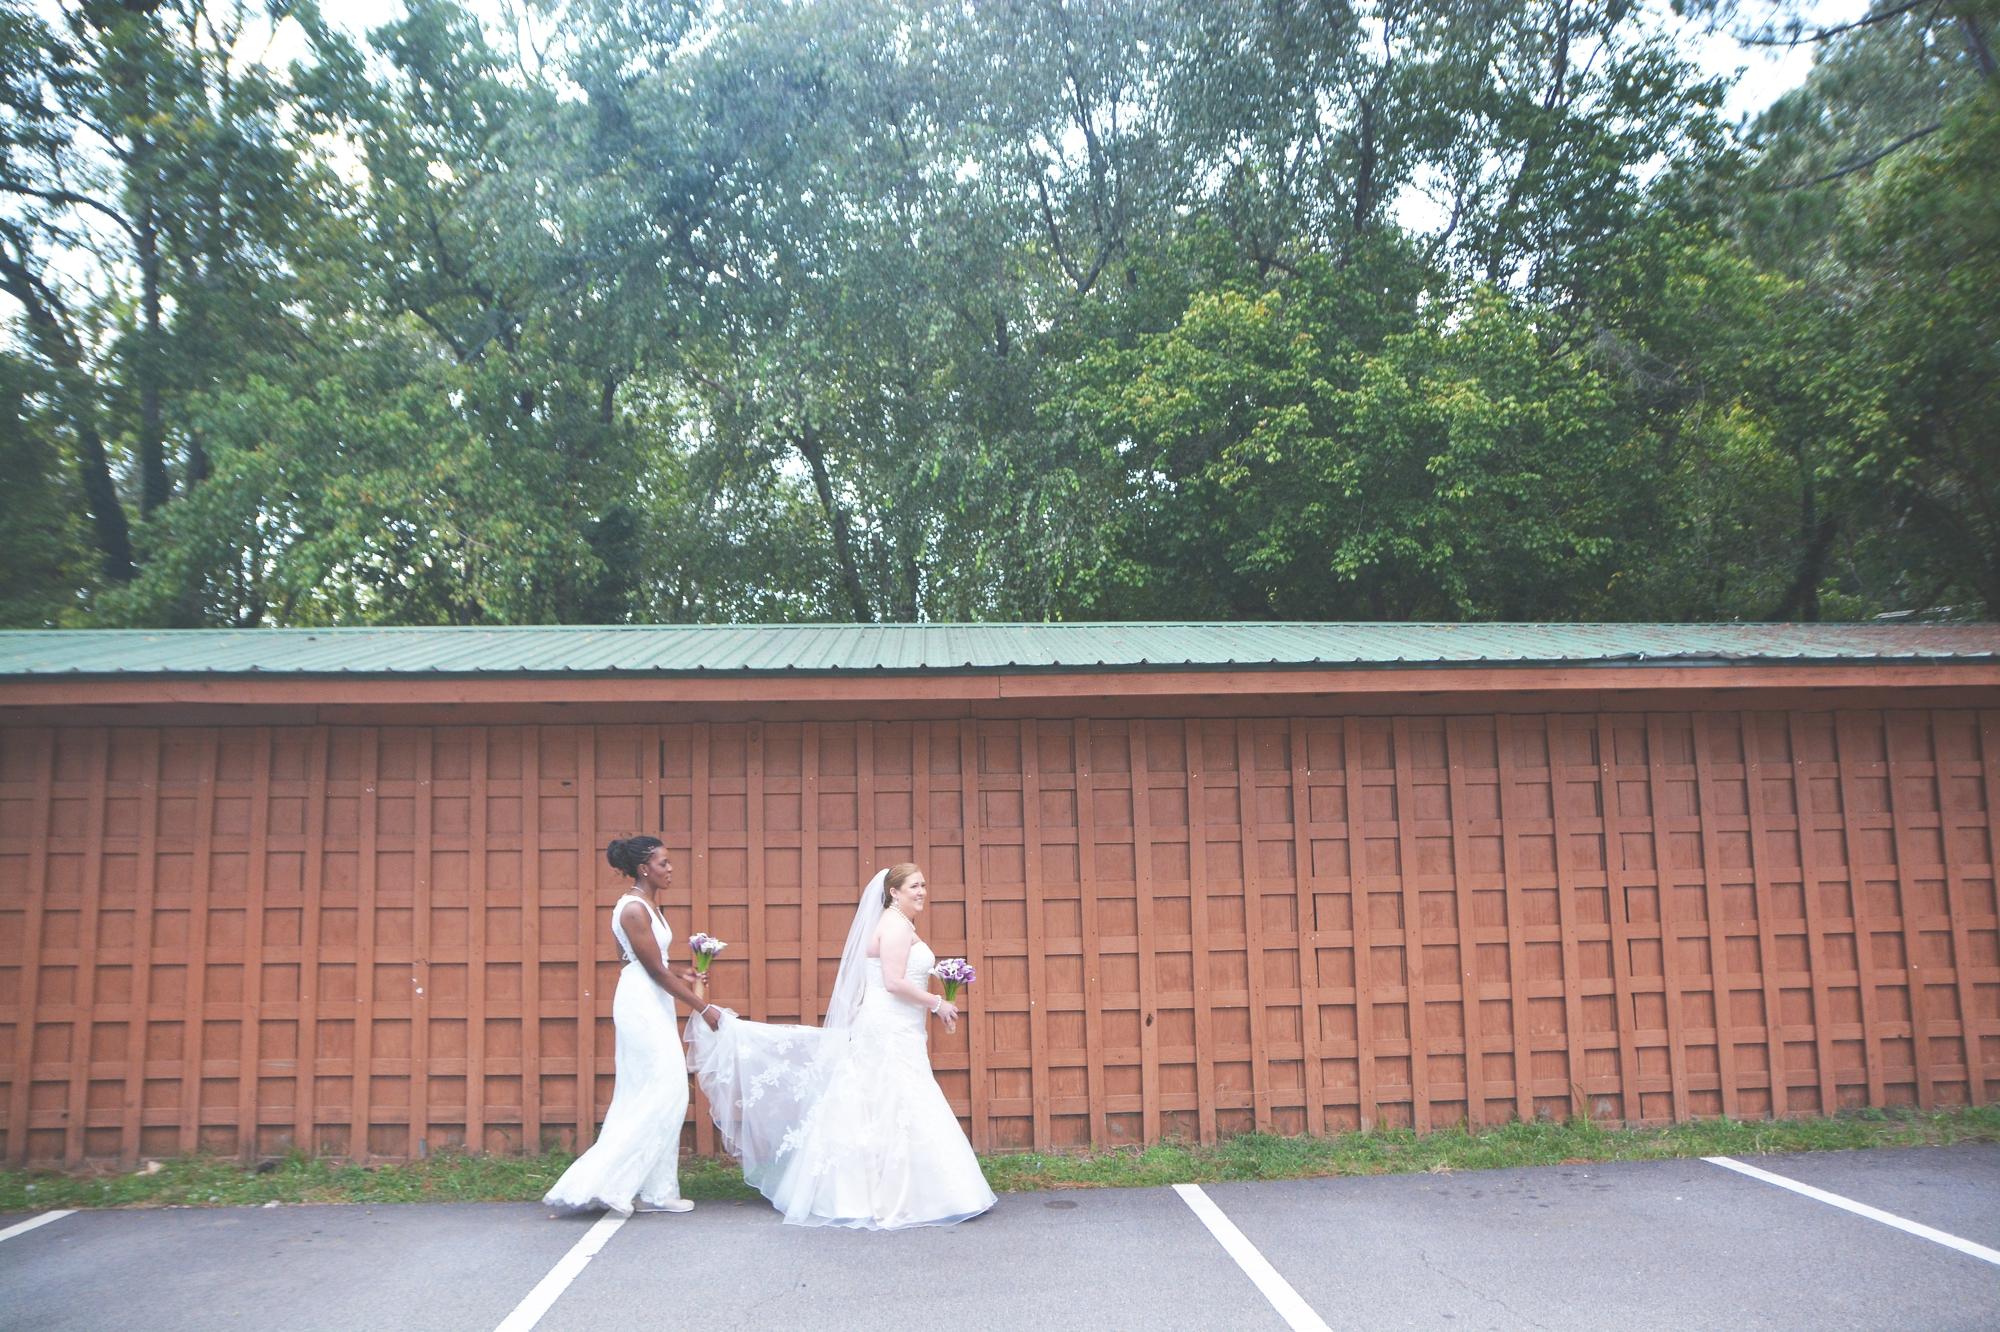 interracial-same-sex-wedding-six-hearts-photography-15